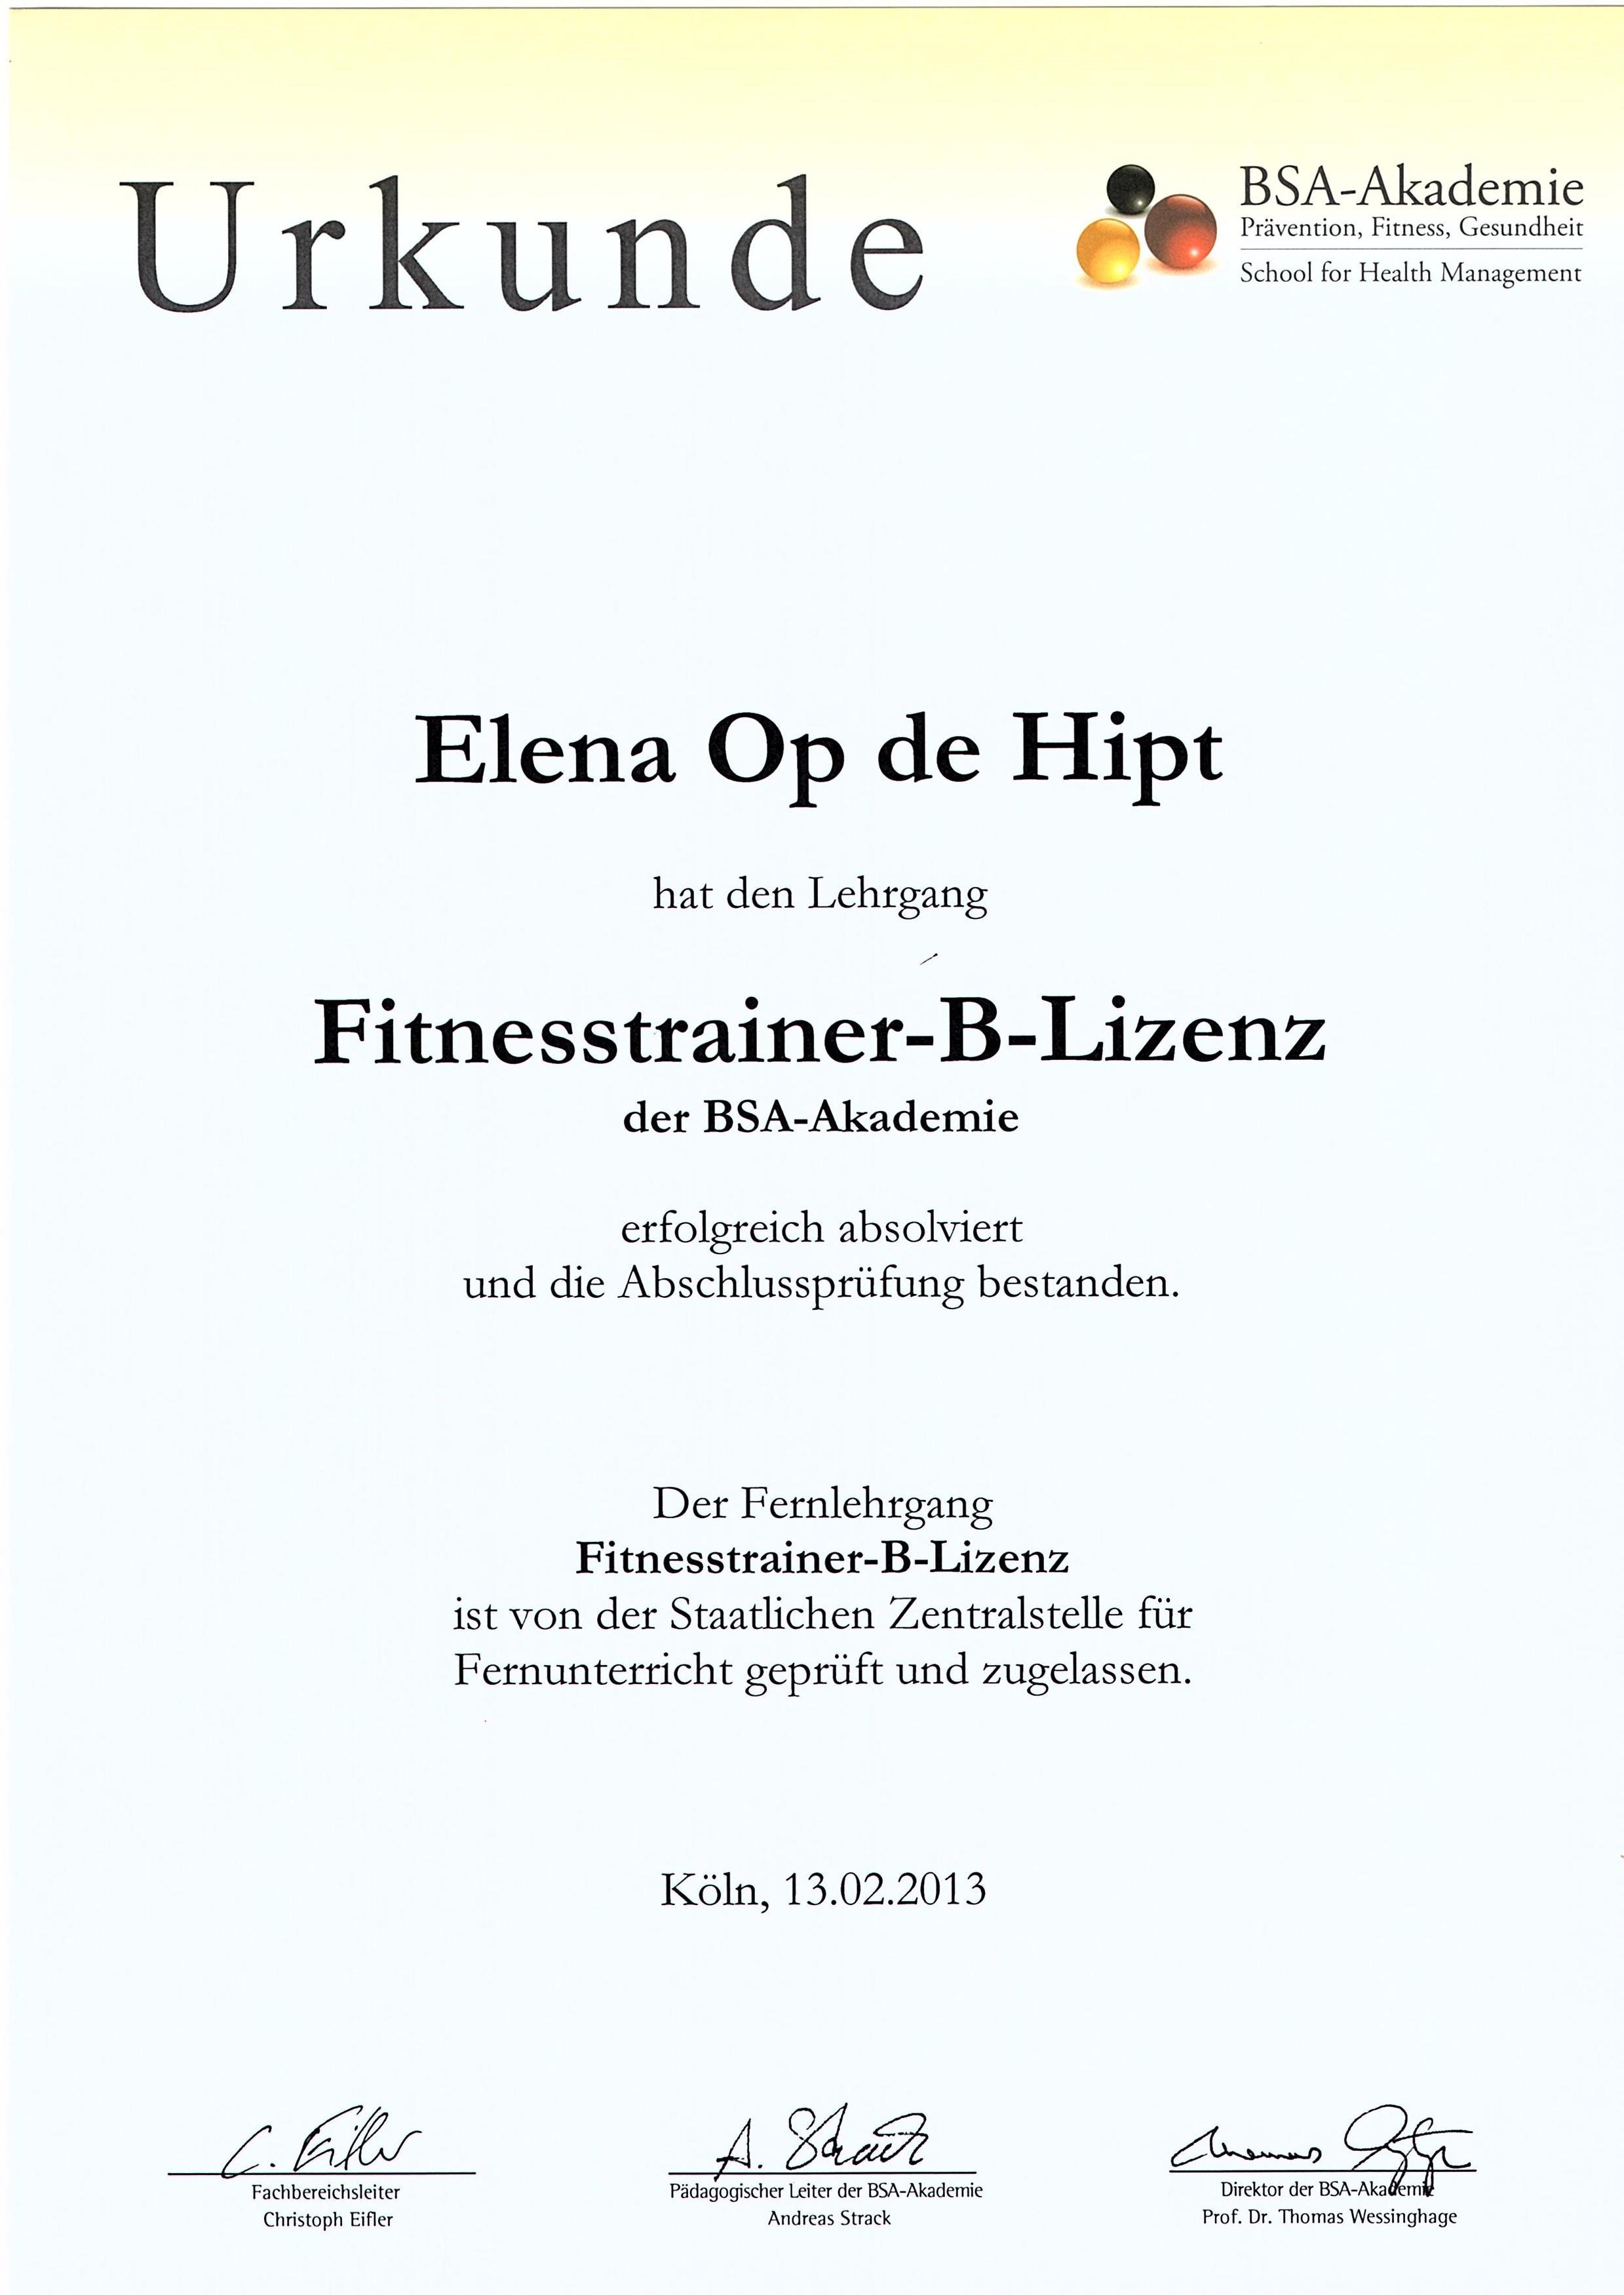 Fitness trainer B-License